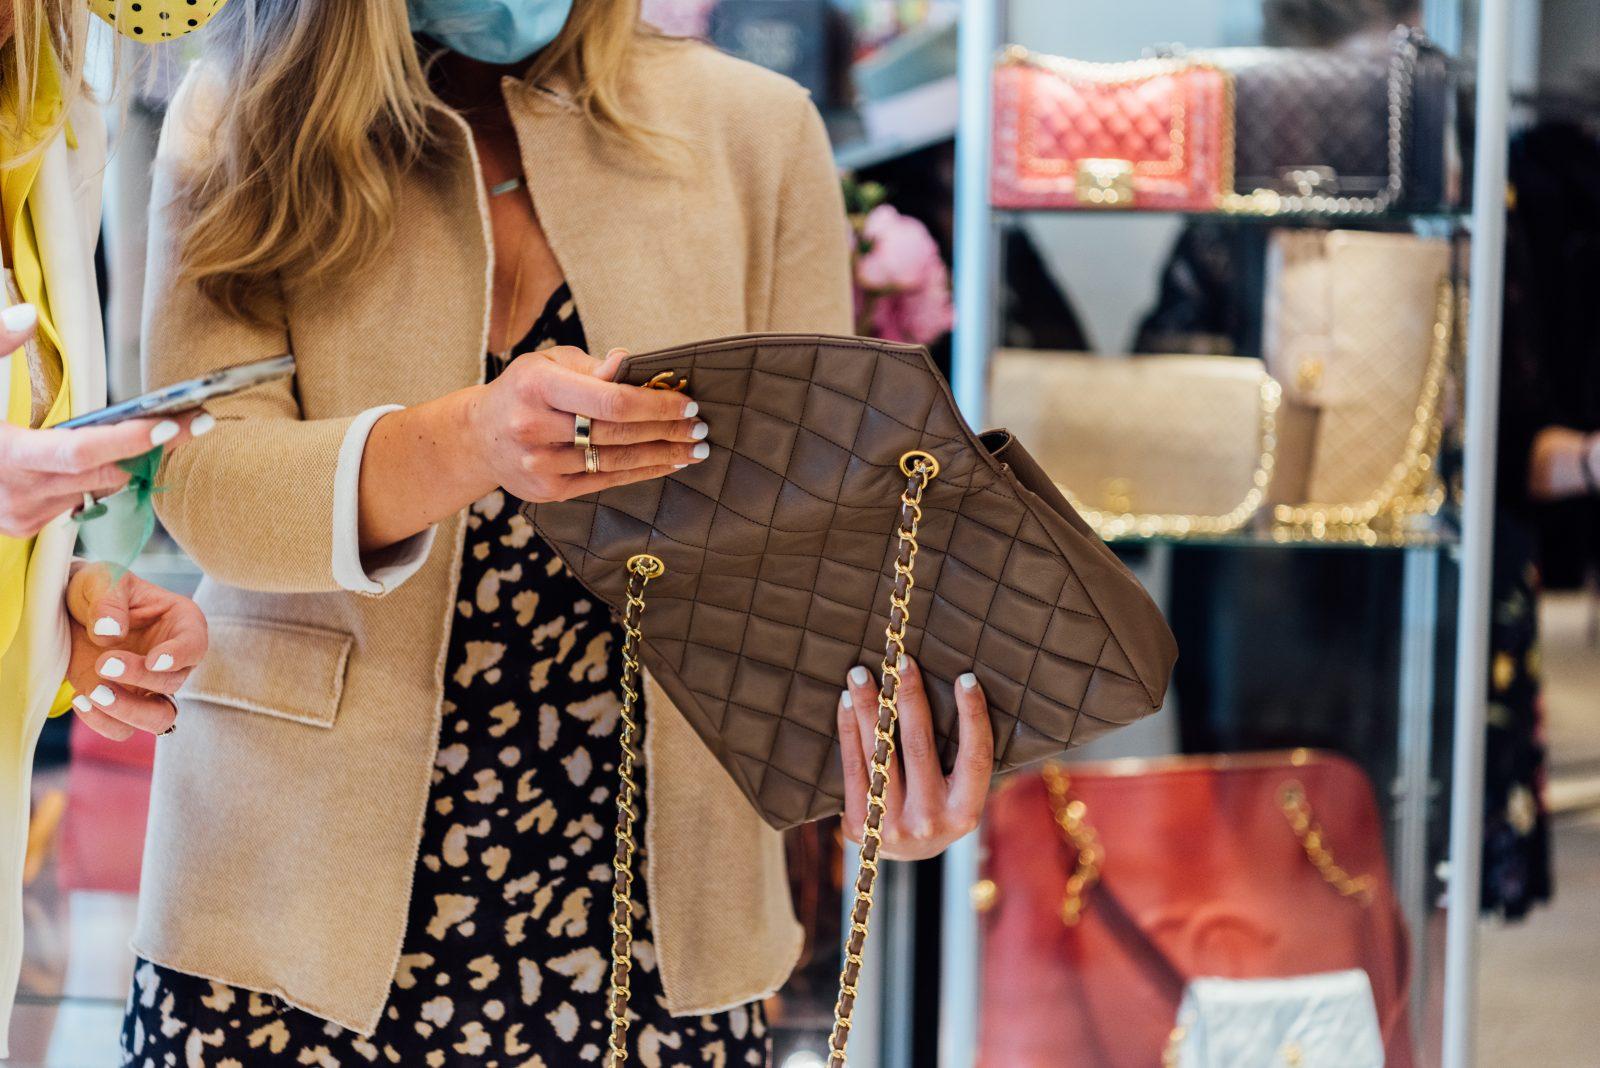 Brown Chanel stitched handbag